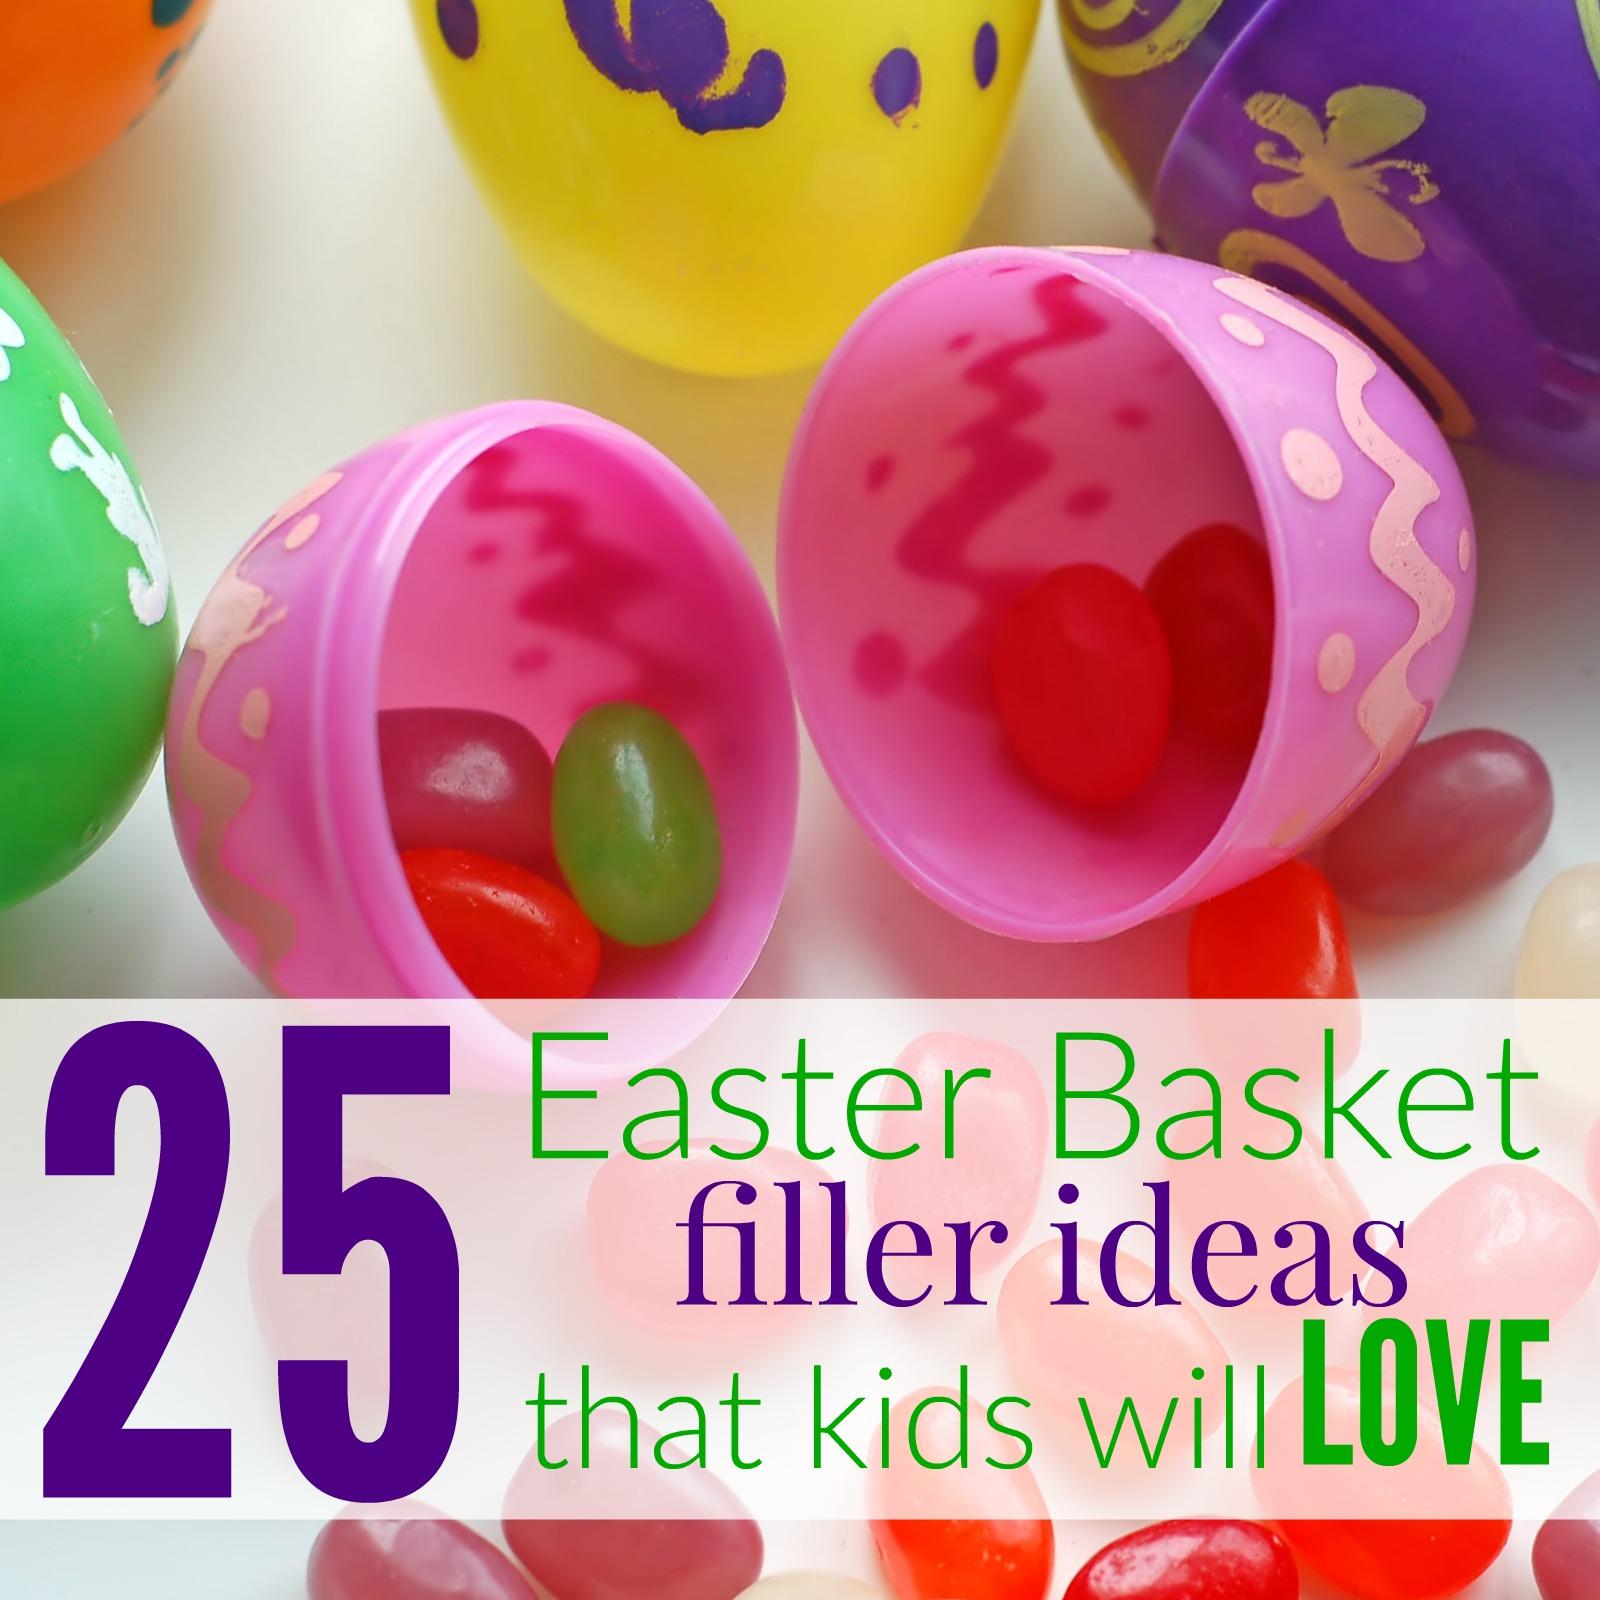 25 Easter Basket Filler Ideas That Kids Will Love